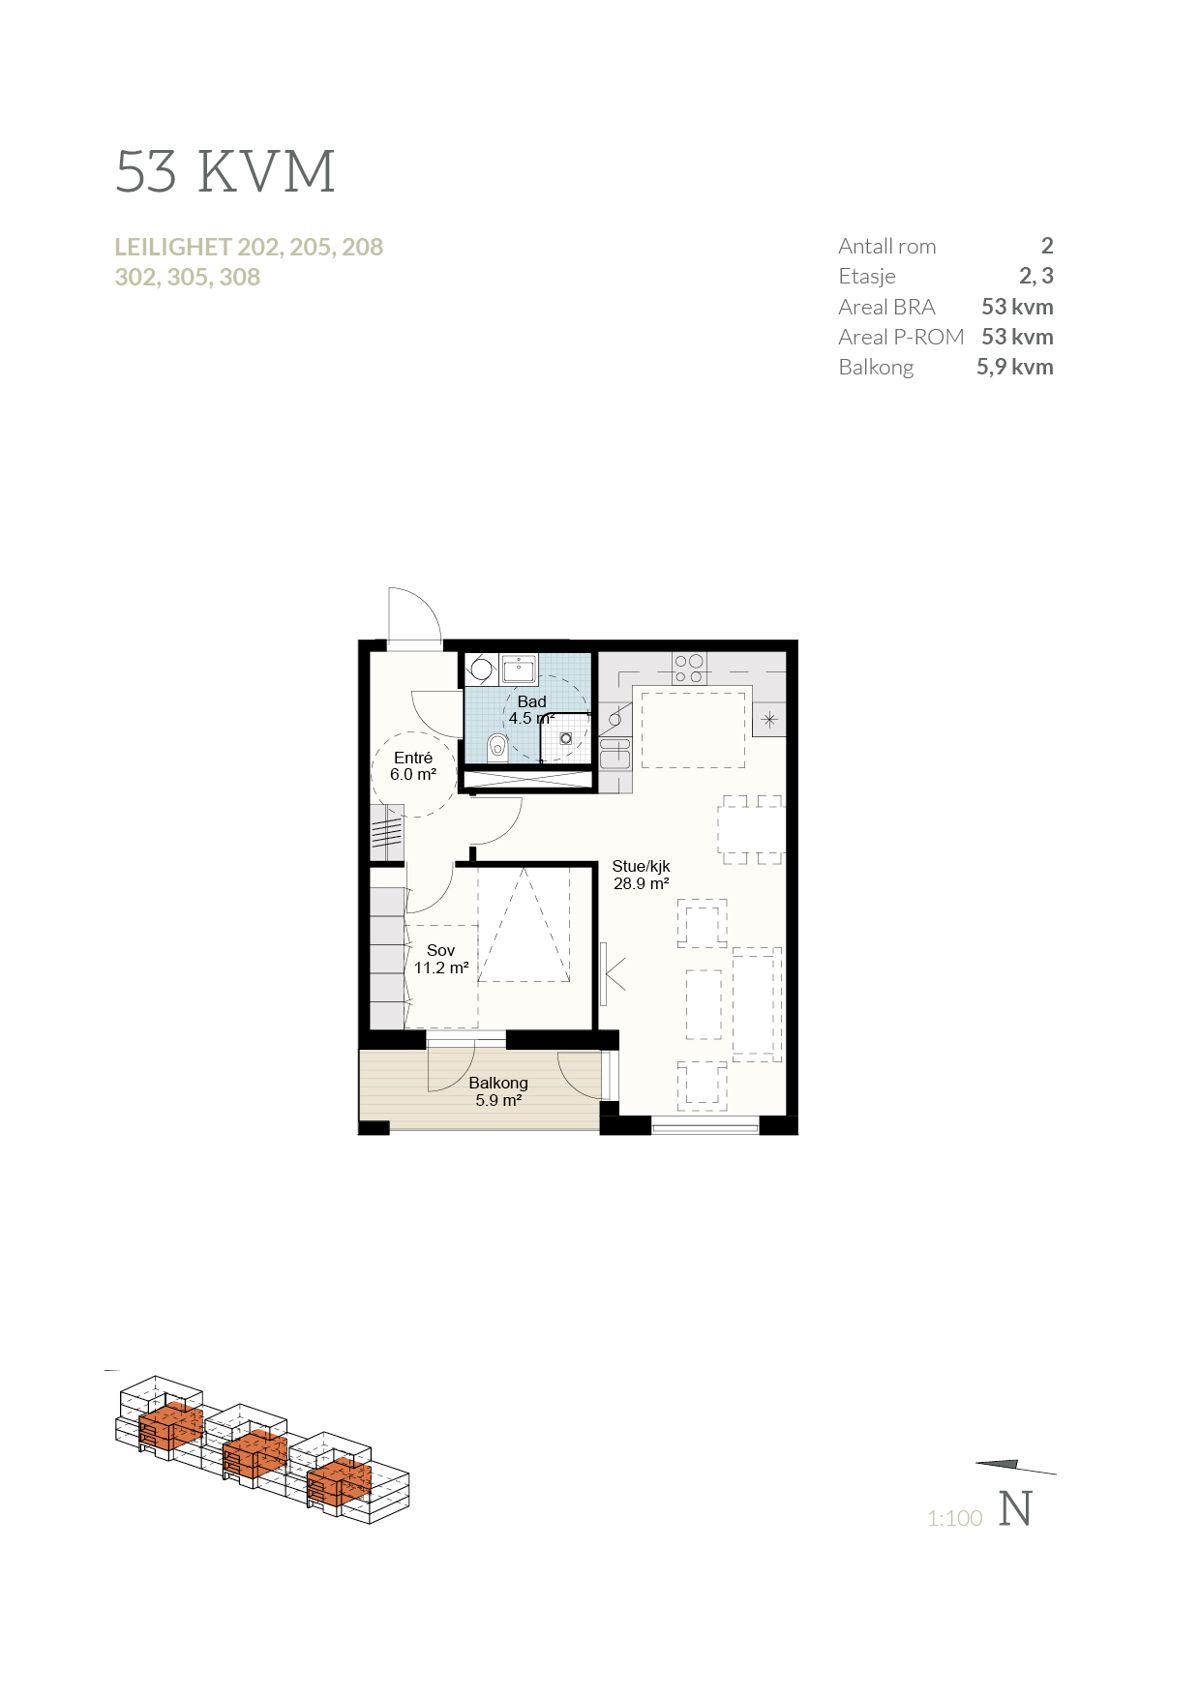 Brånåslunden Plantegning leilighet 305